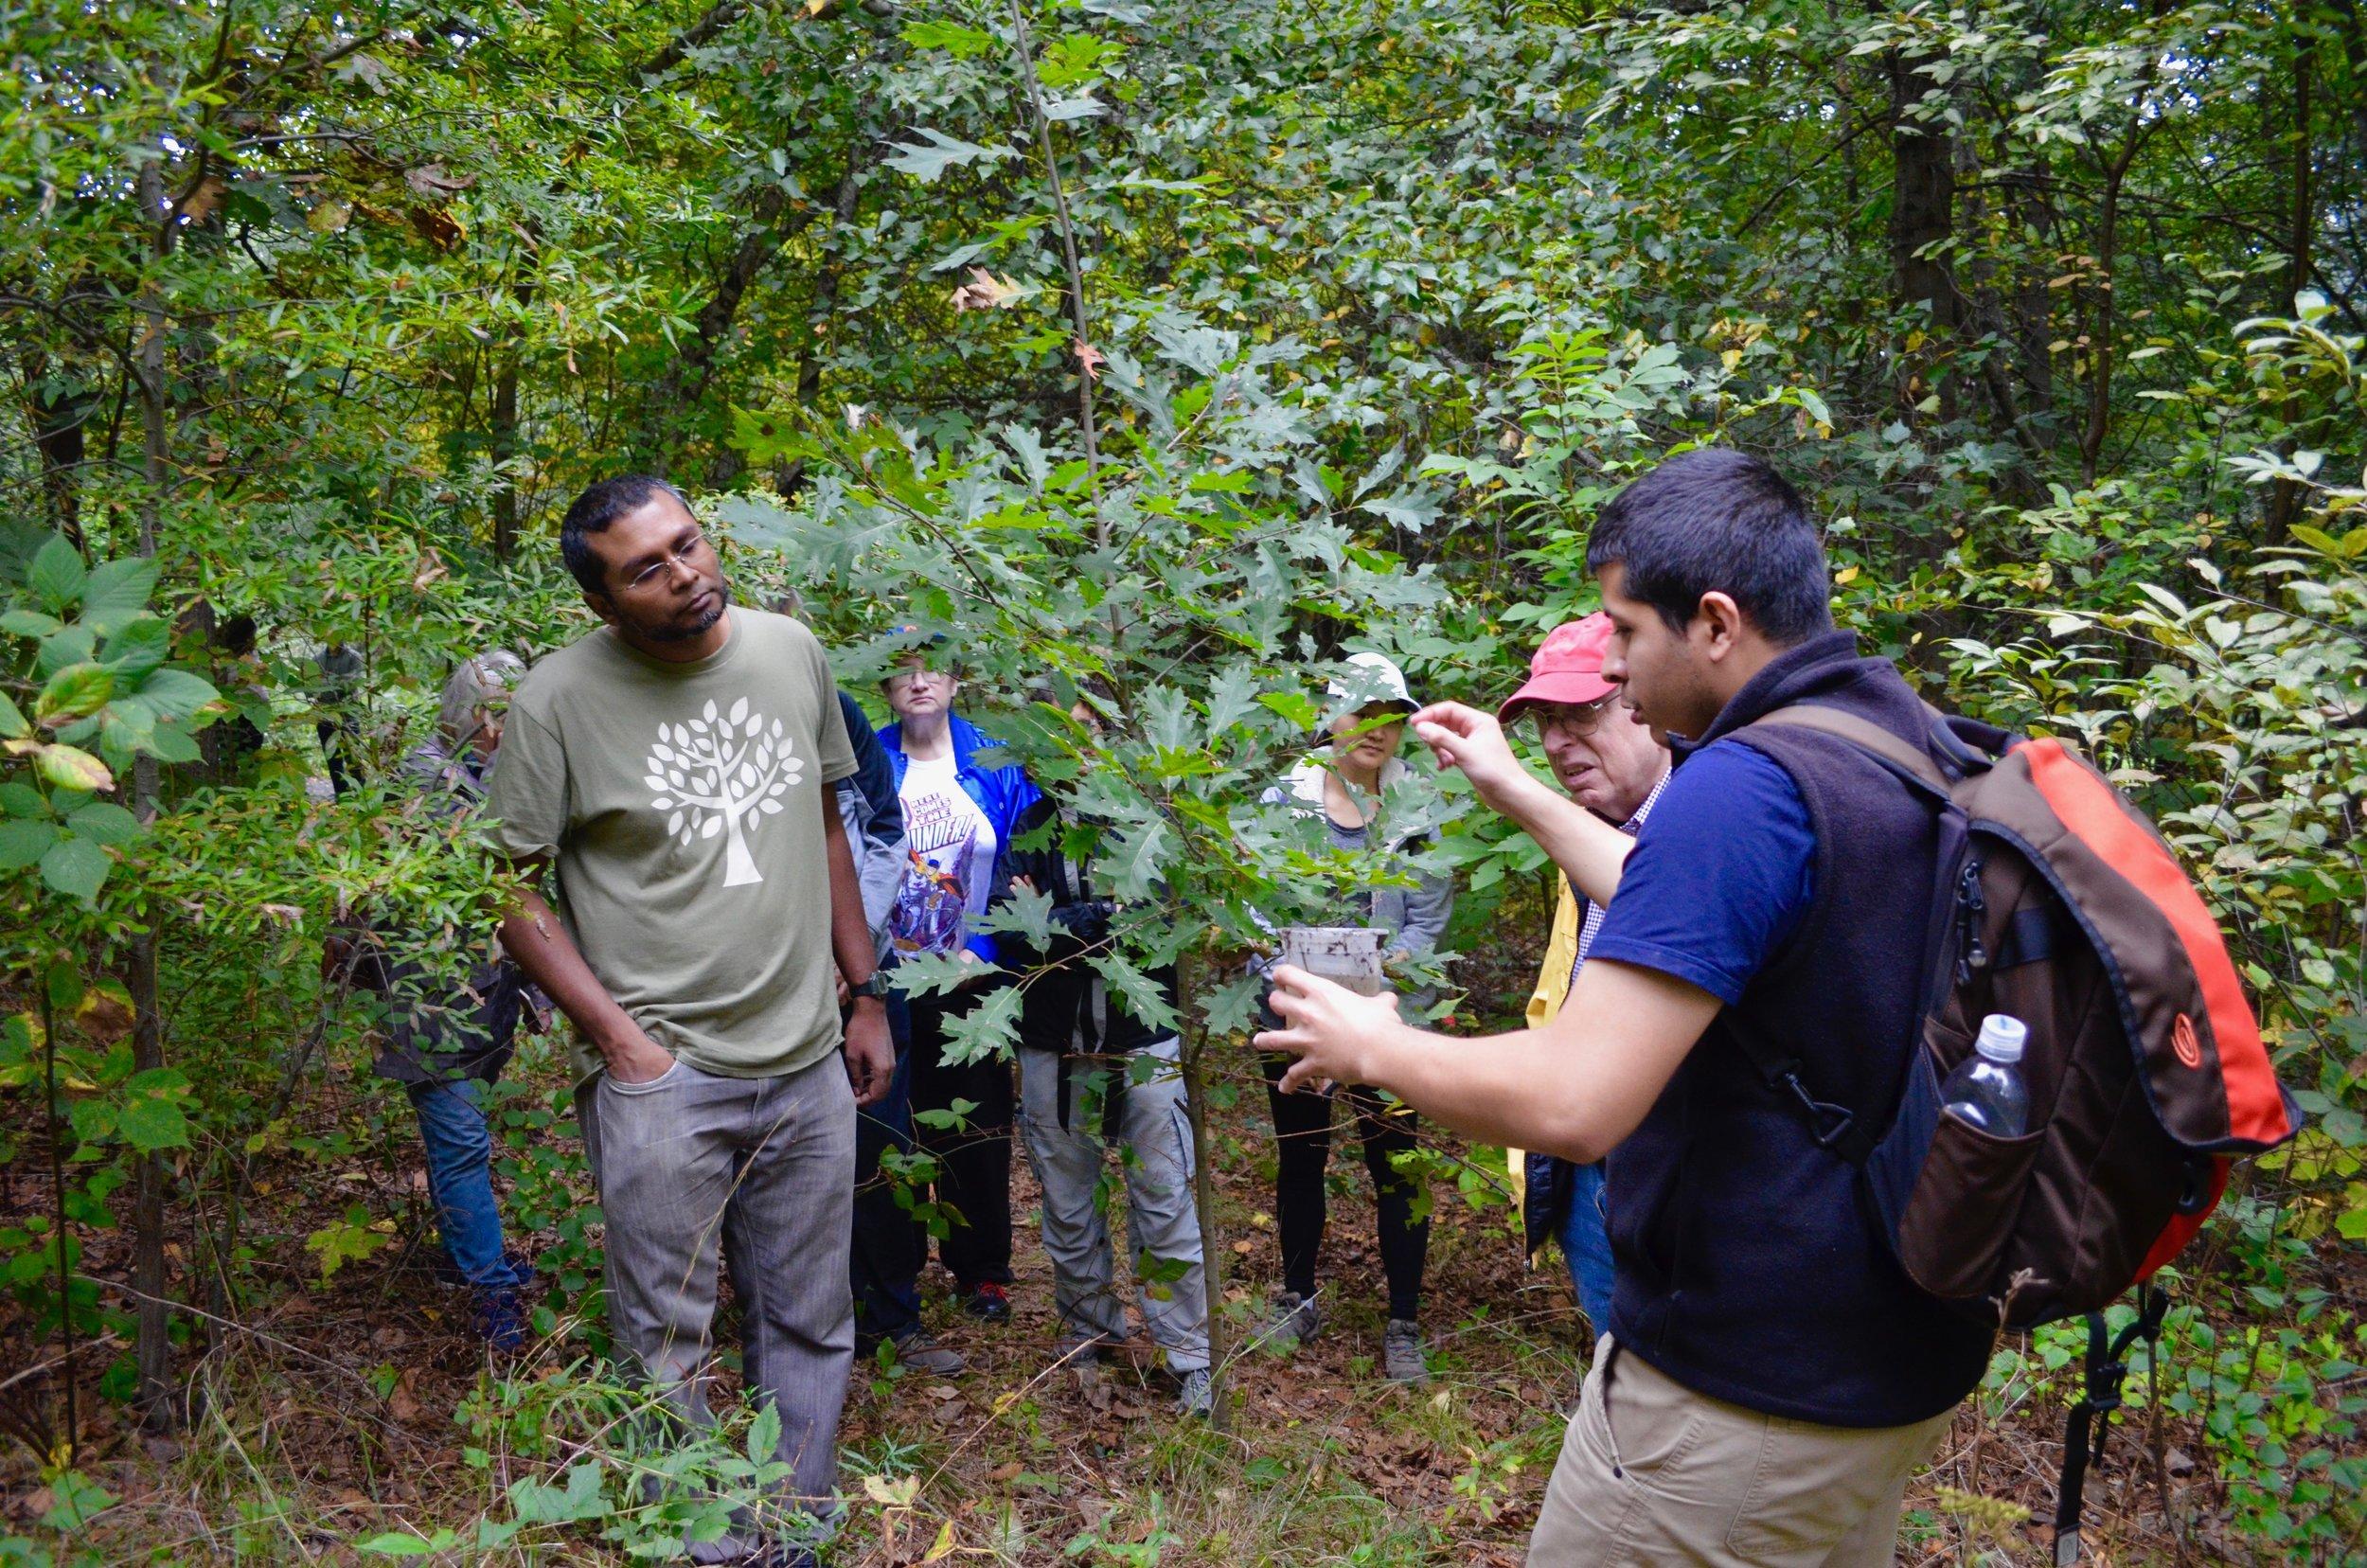 Ecology and Biological Inventory of Van Cortlandt Park - October 6